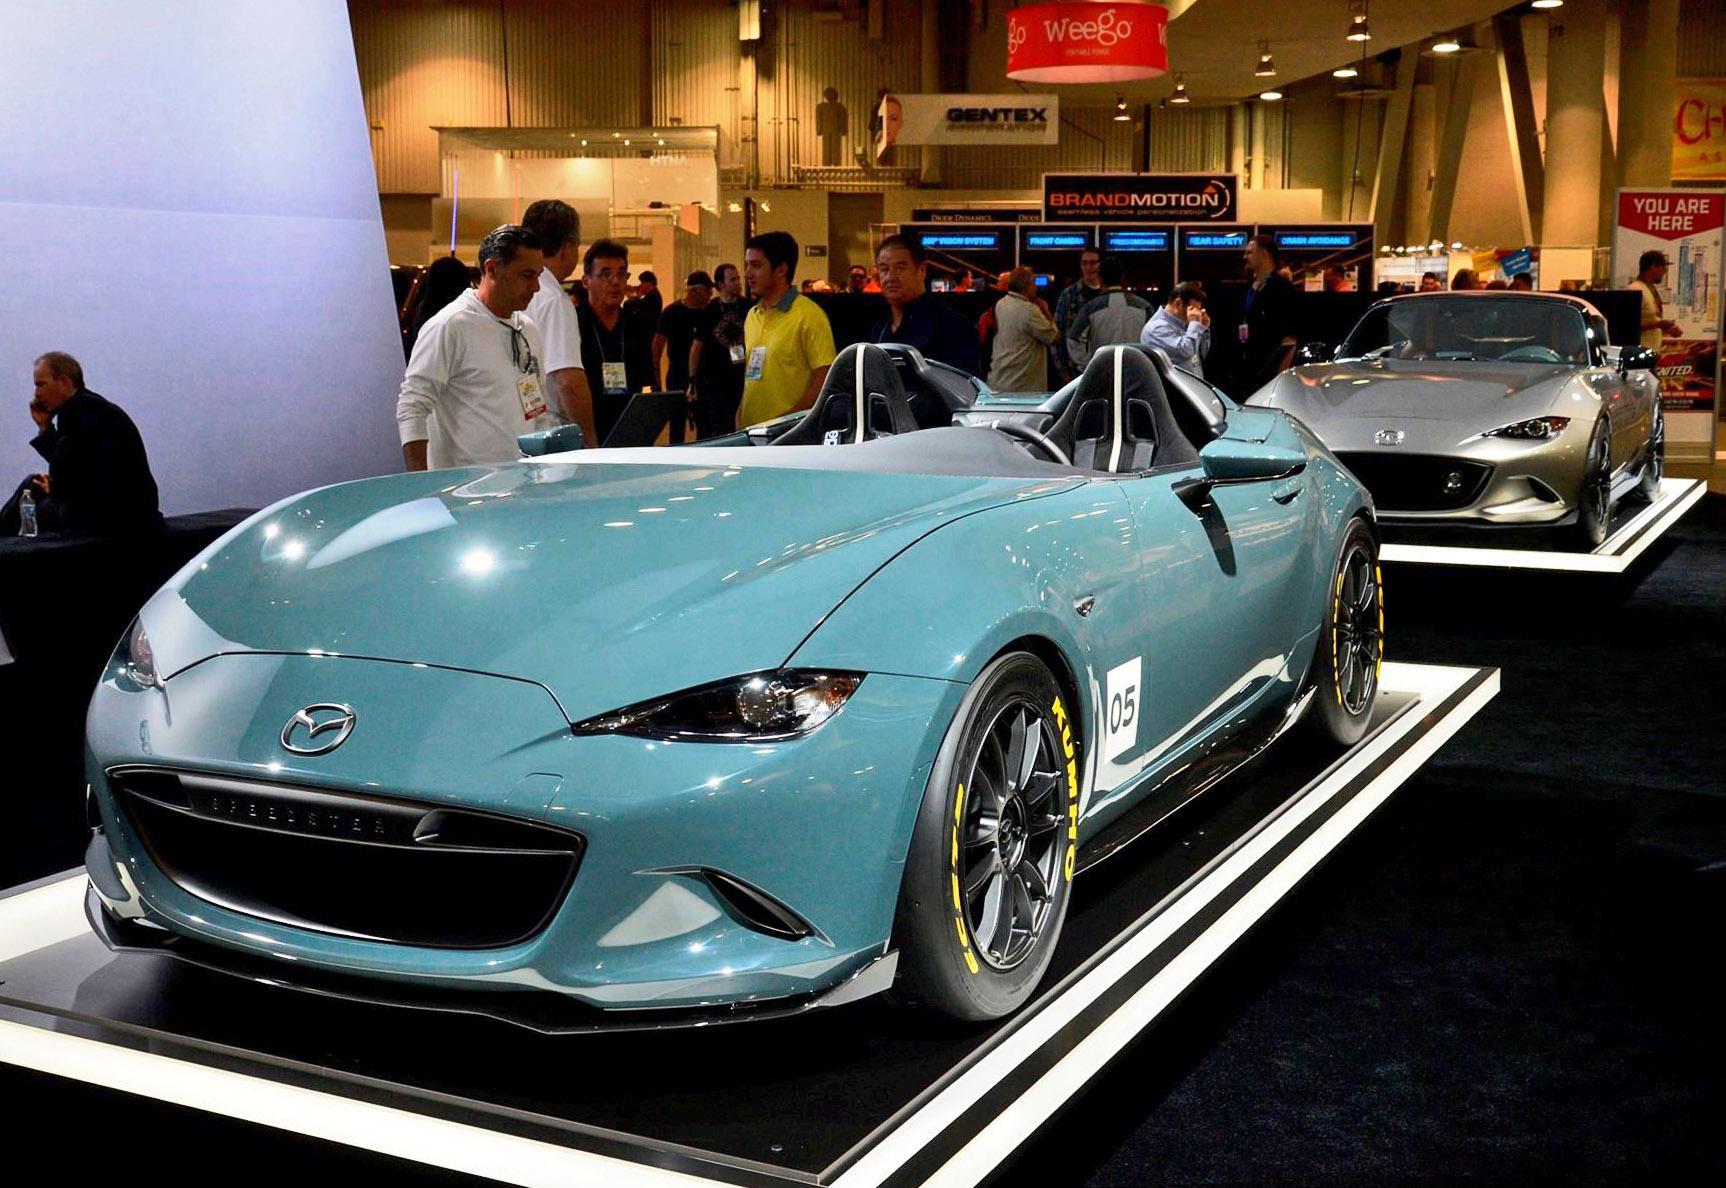 http://www.car-revs-daily.com/wp-content/uploads/2015/11/2016-Mazda-MX-5-Spyder-Versus-MX-5-Speedster-Concepts-322.jpg